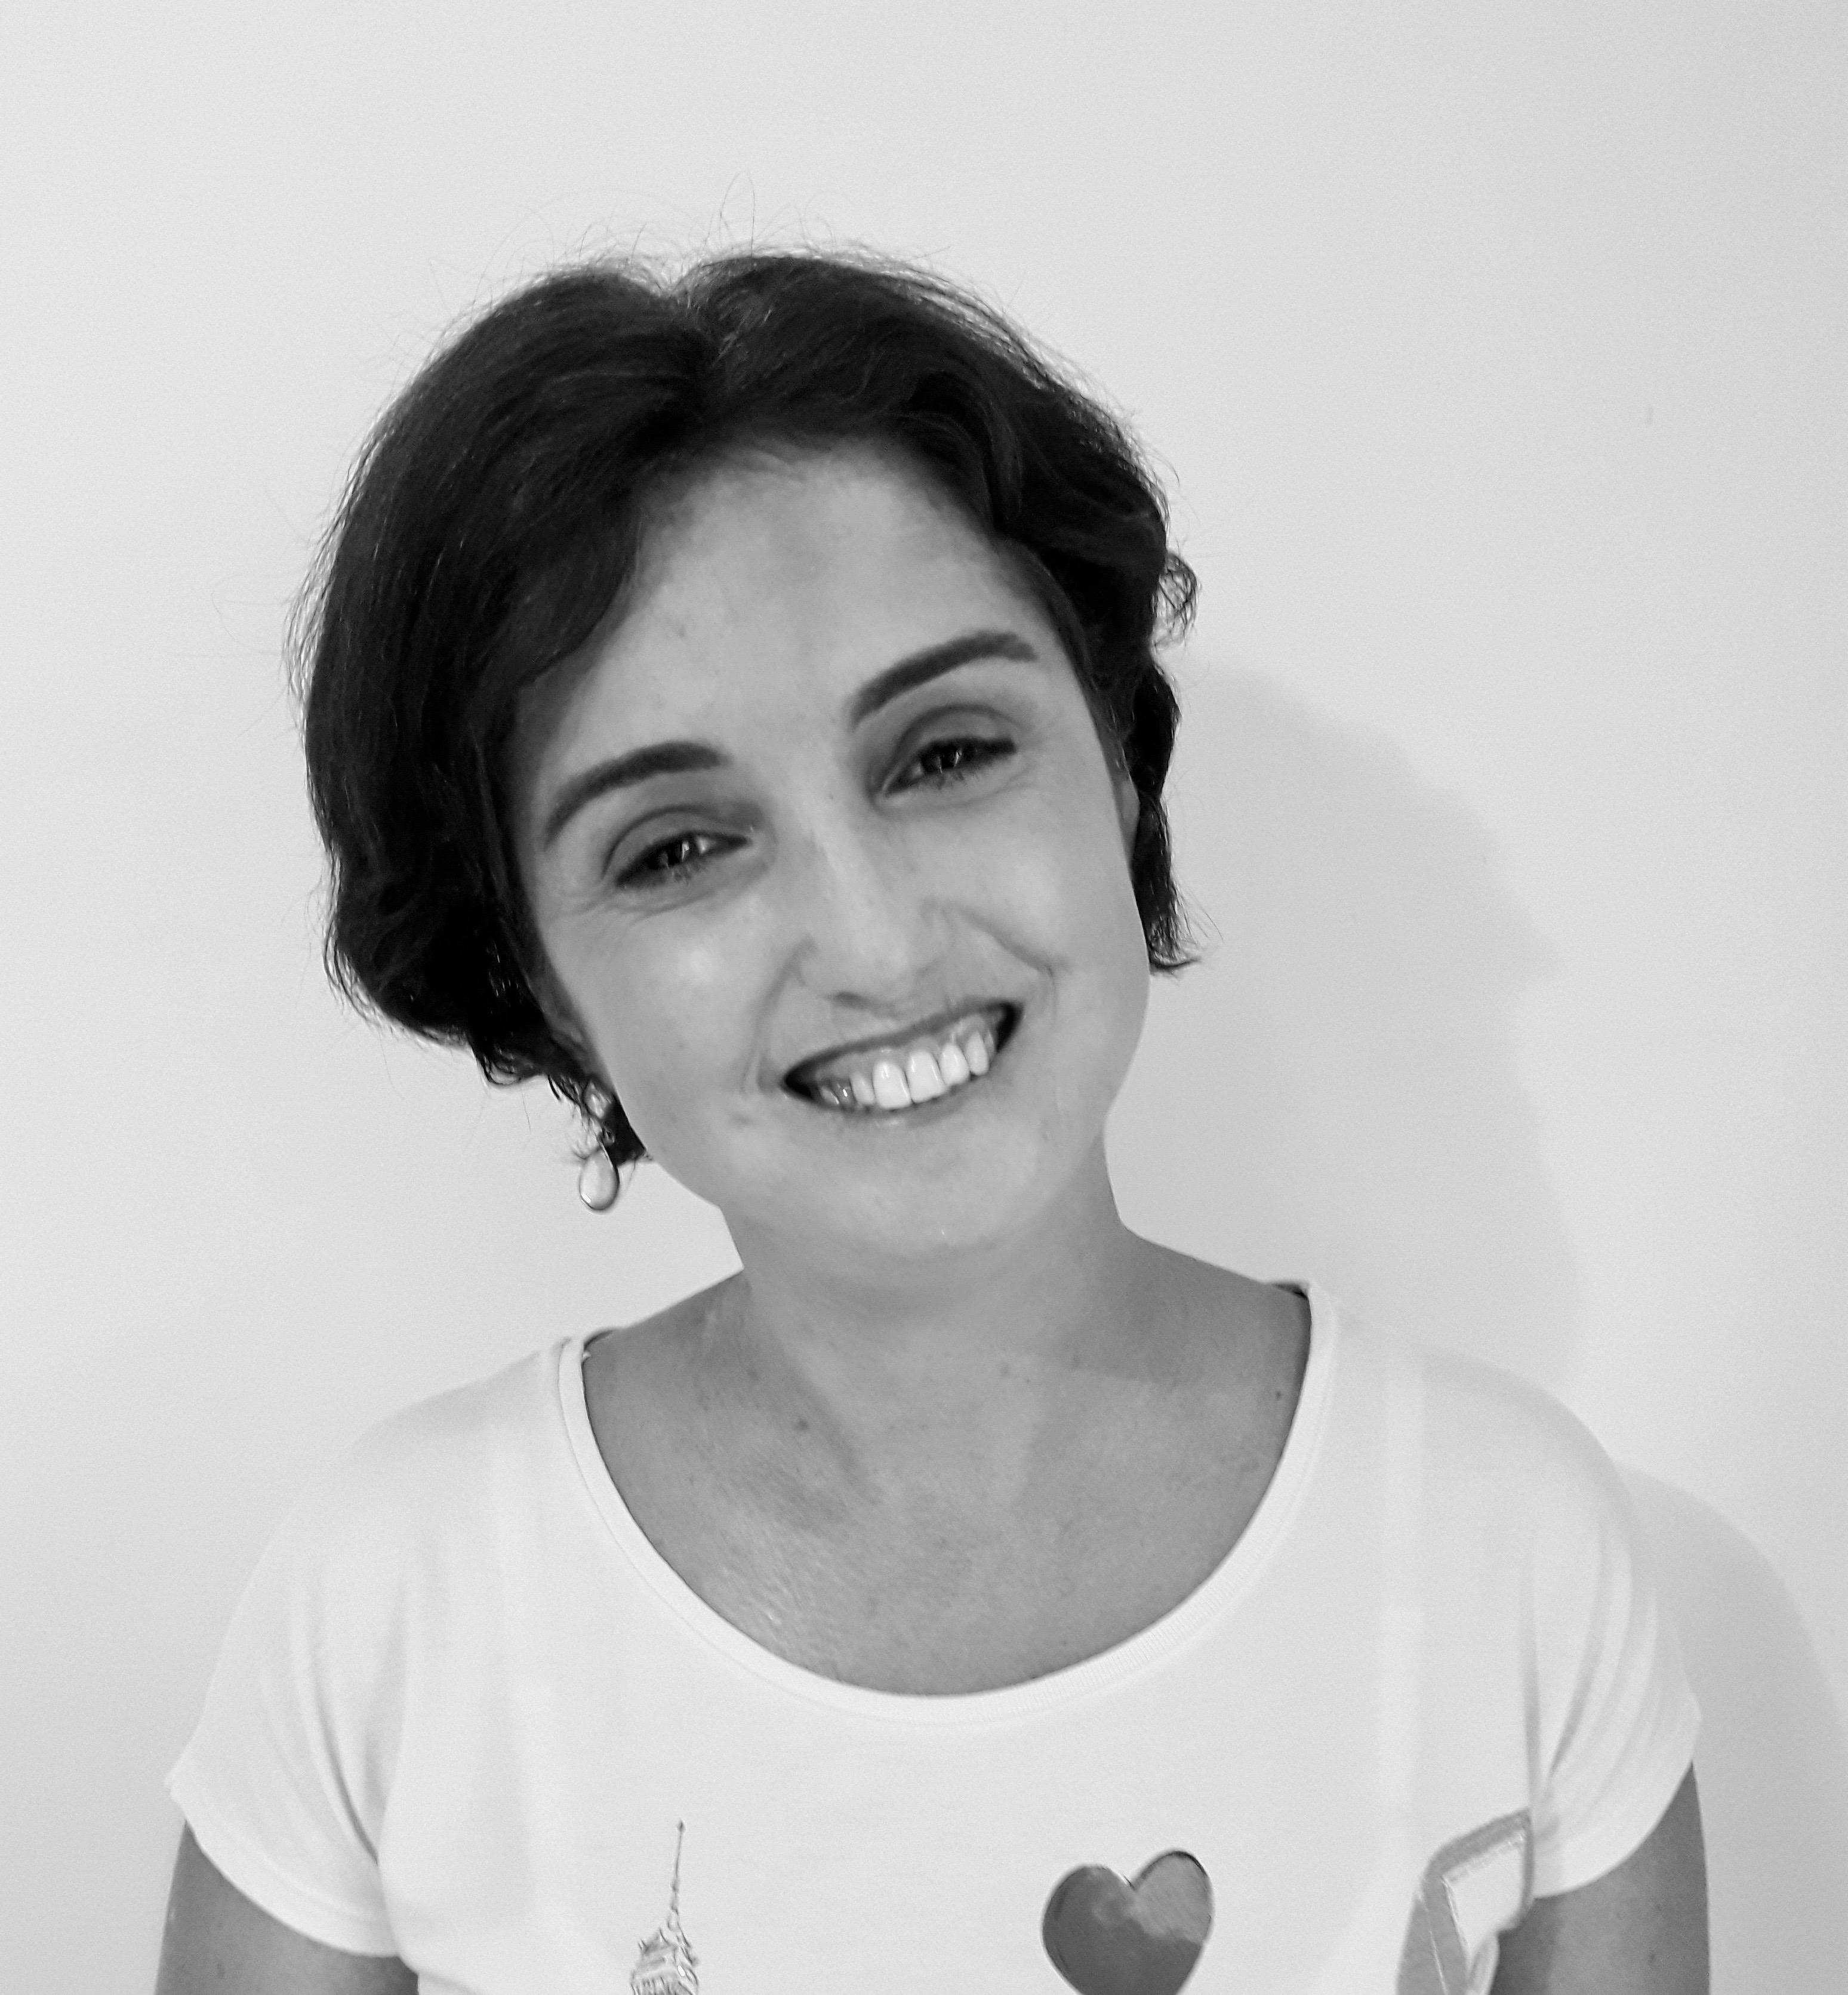 Ana Lúcia Freire Tanaka